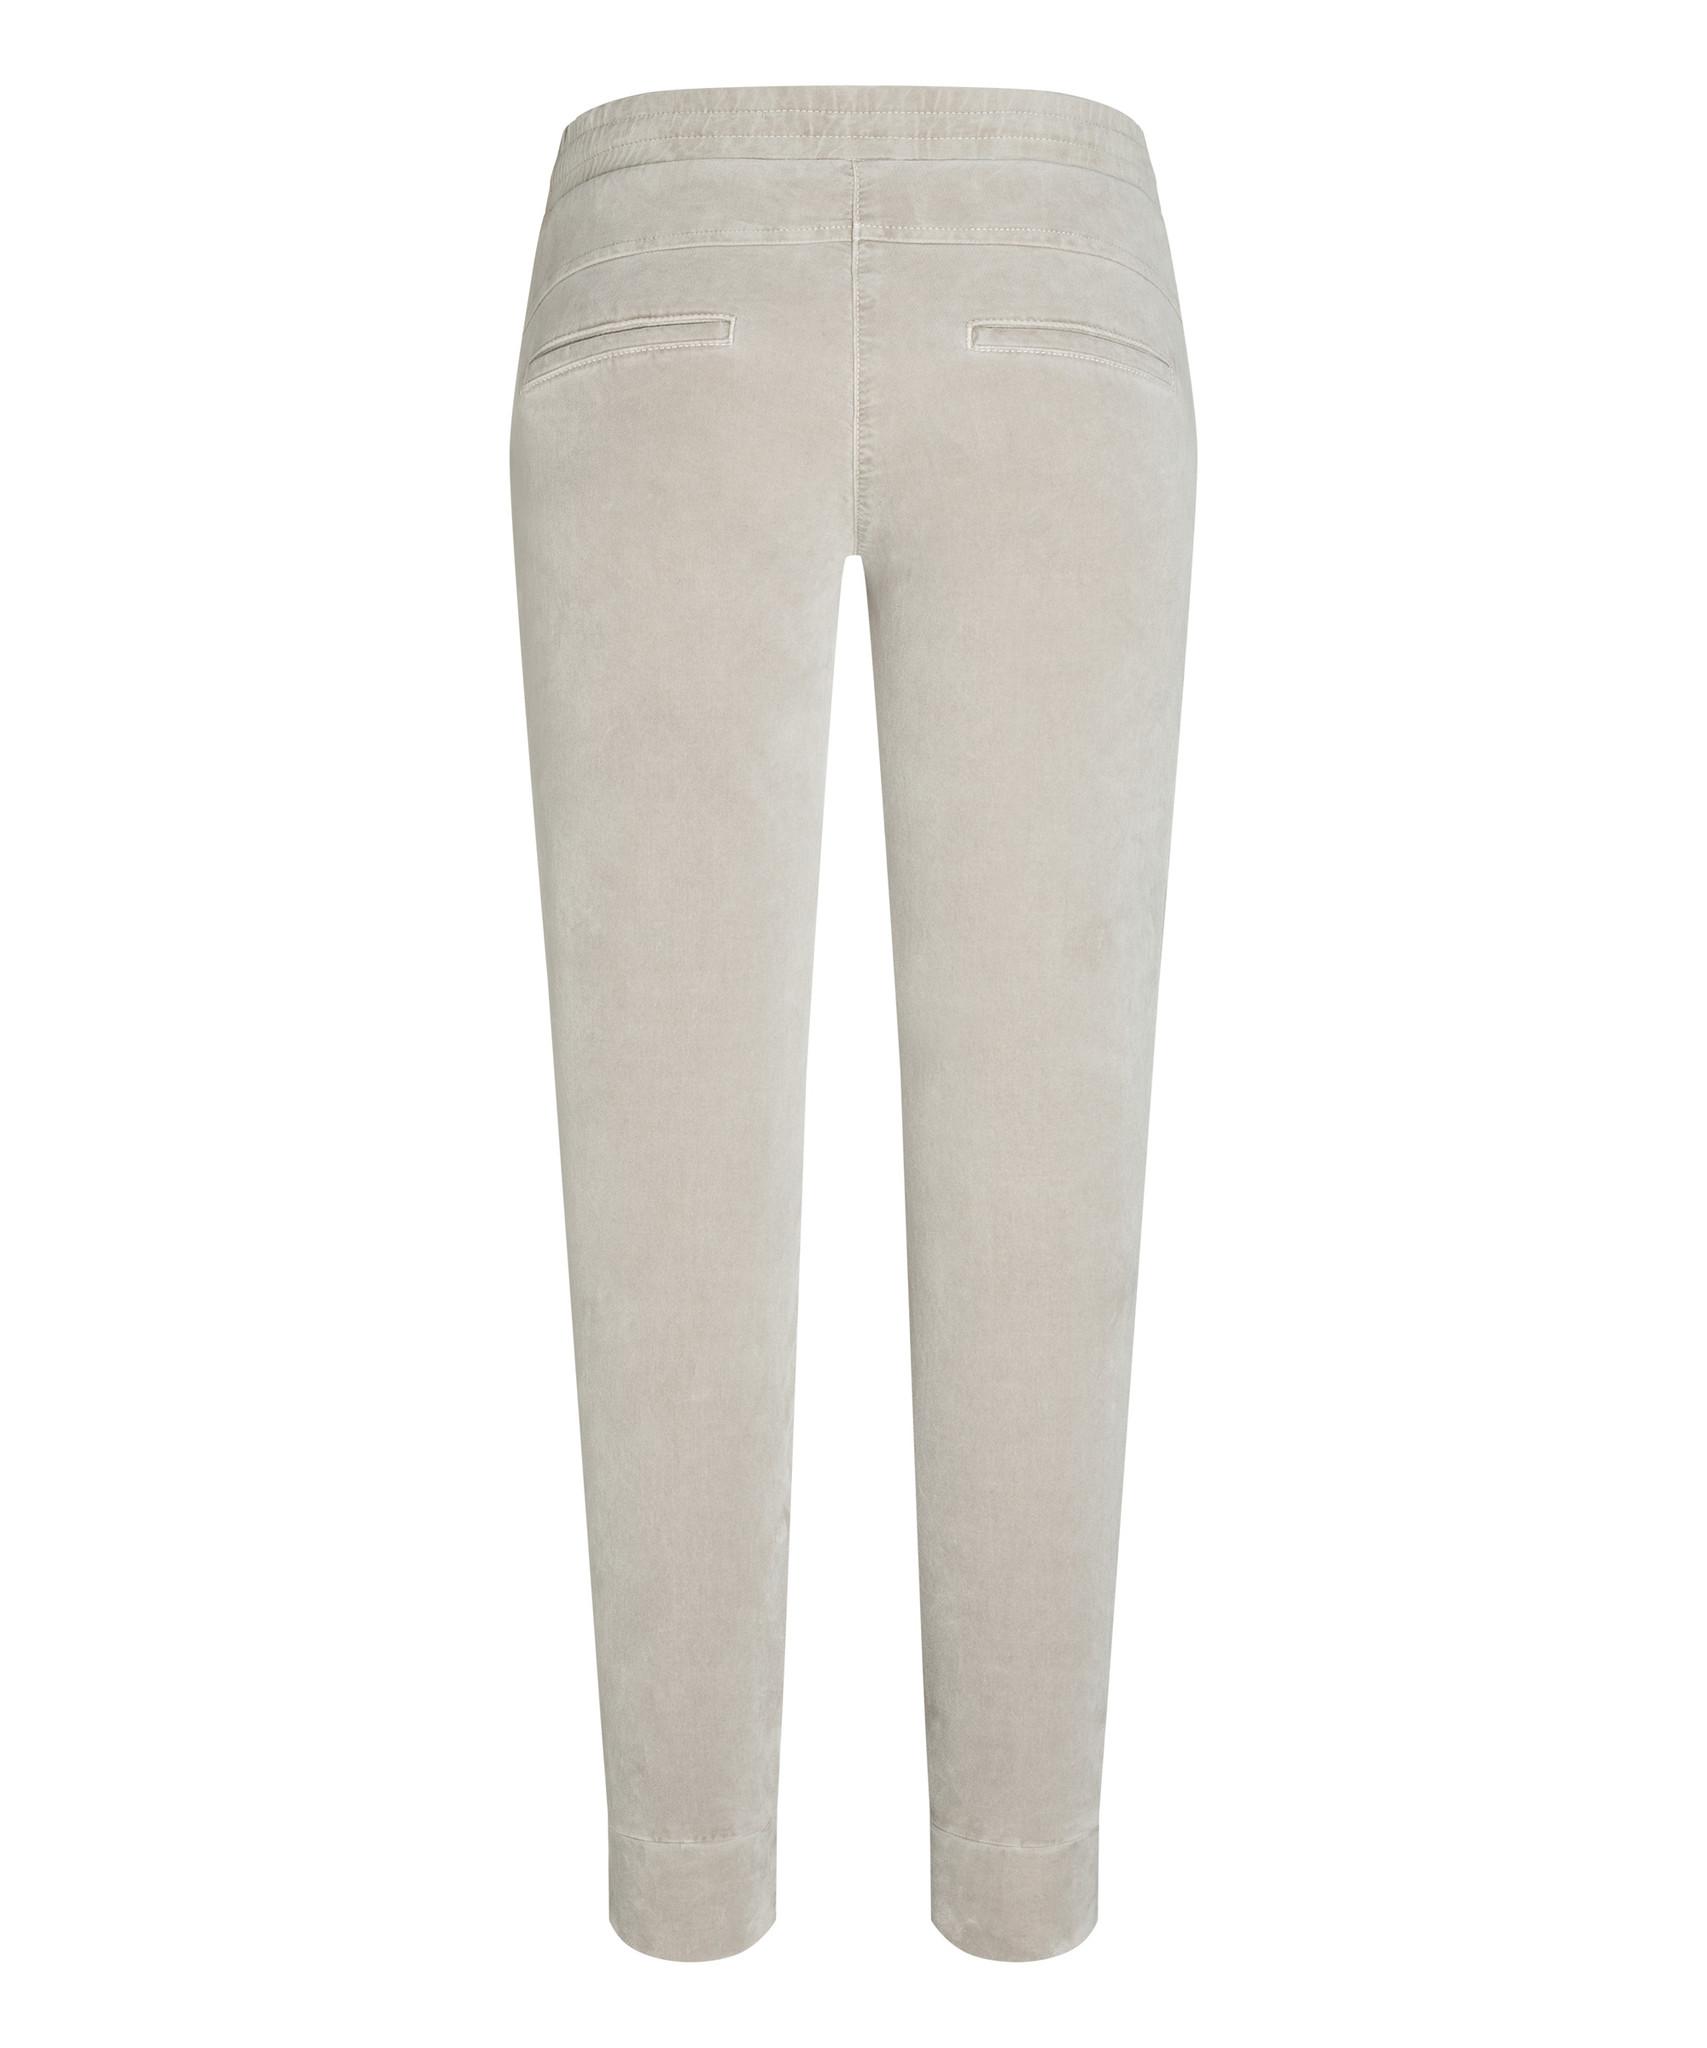 Cambio trousers JORDEN 7505-2